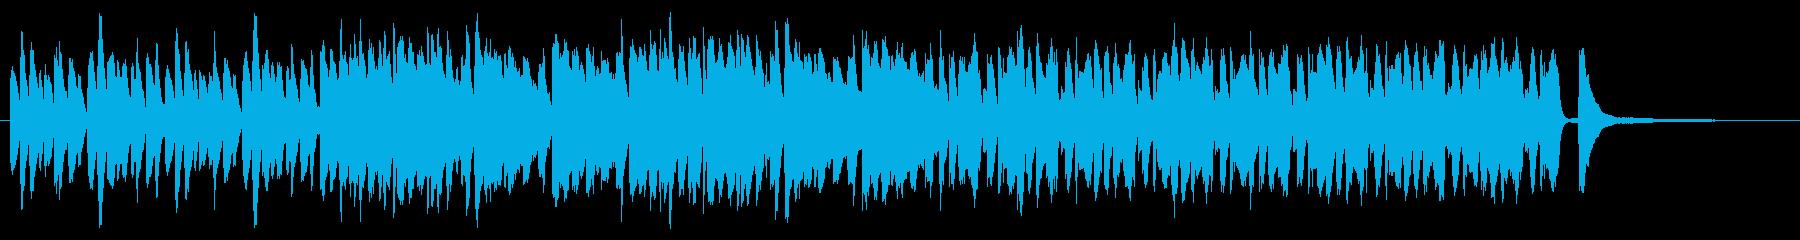 SNS広告 ピアノメイン ハッピーの再生済みの波形